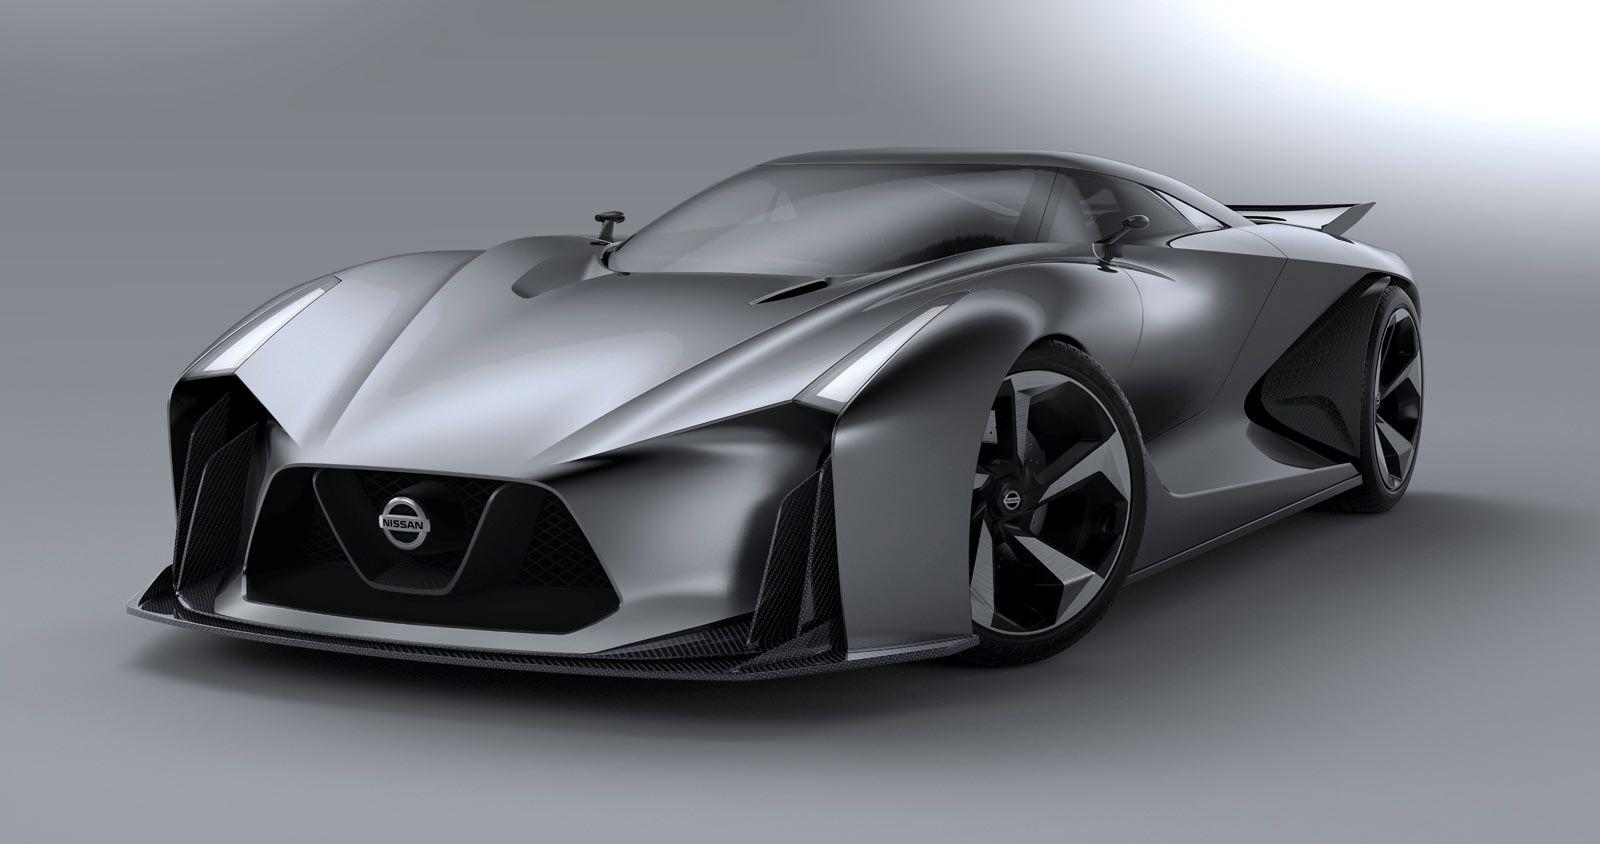 Nissan Concept 2020 Vision Gran Turismo Gtr Nismo Nissan Gtr Nismo Nissan Gtr